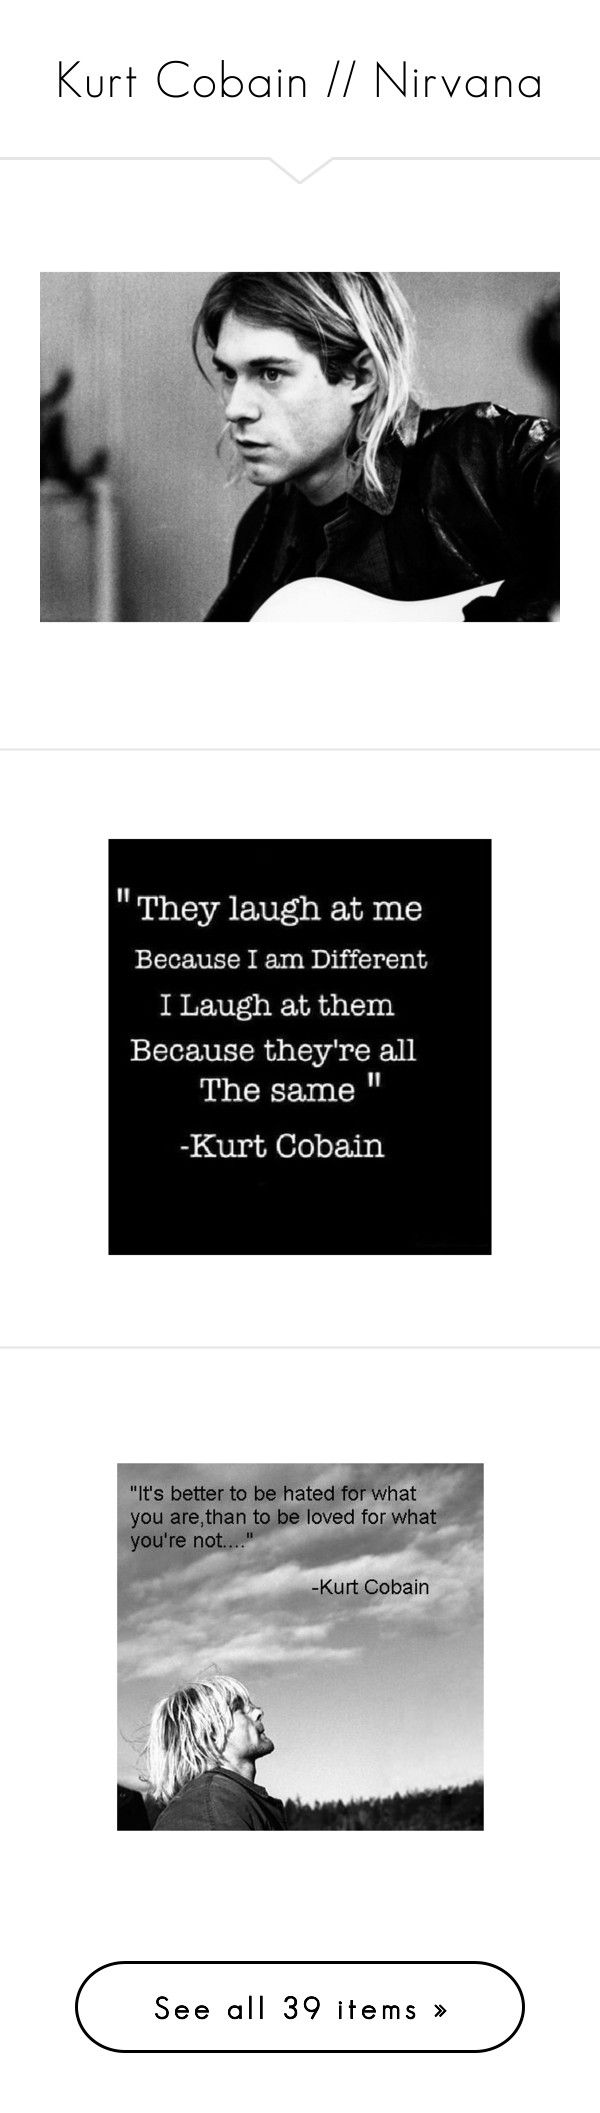 """Kurt Cobain // Nirvana"" by bringmetheblackparade1 ❤ liked on Polyvore featuring quotes, nirvana, people, backgrounds, kurt, photos, kurt cobain, pictures, pics and photo"